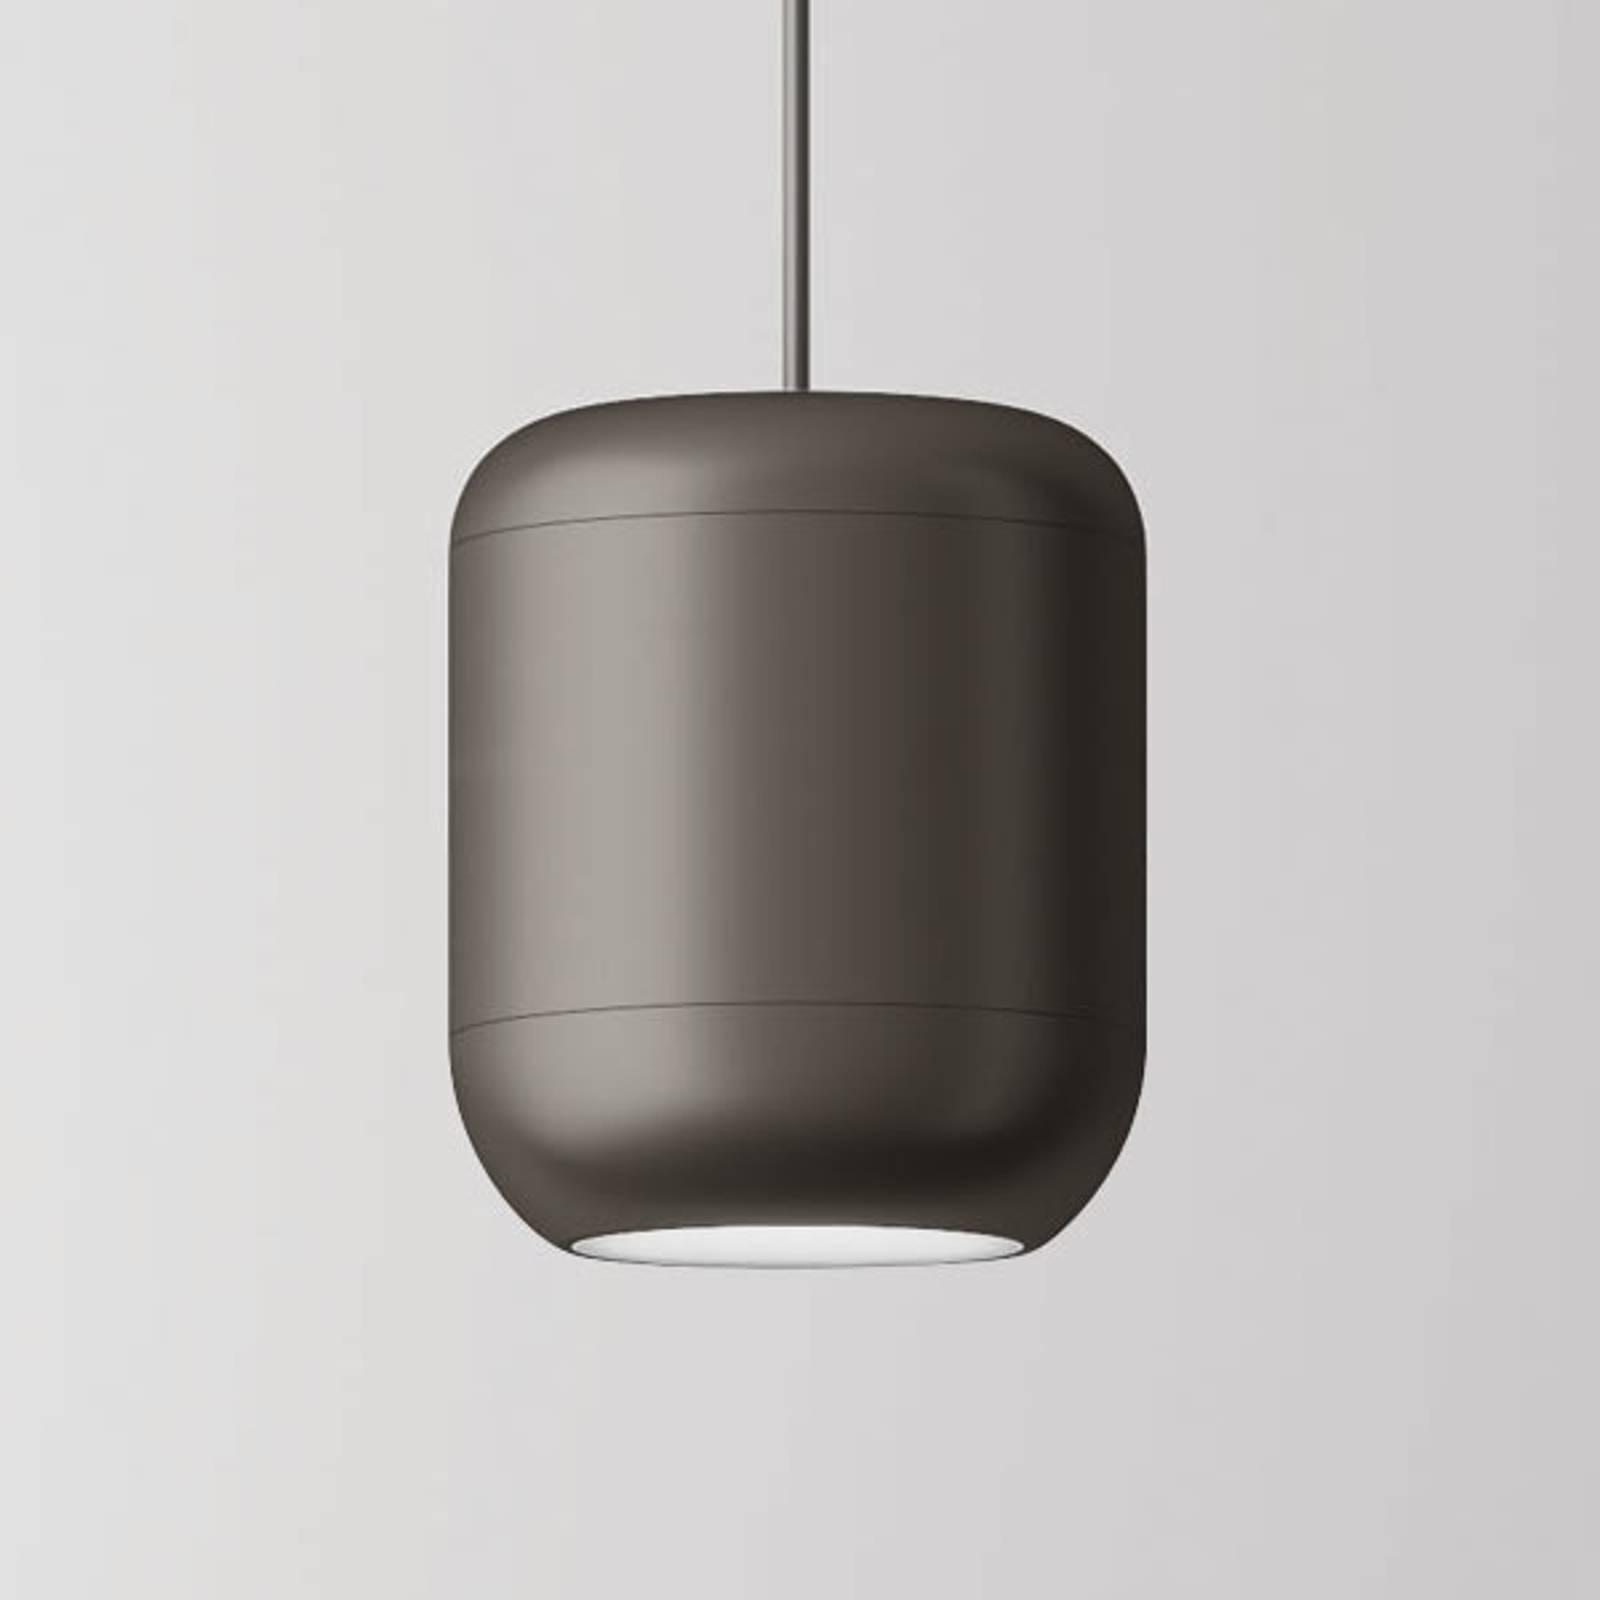 Axolight Urban LED-riippulamppu 26cm nikkeli matta